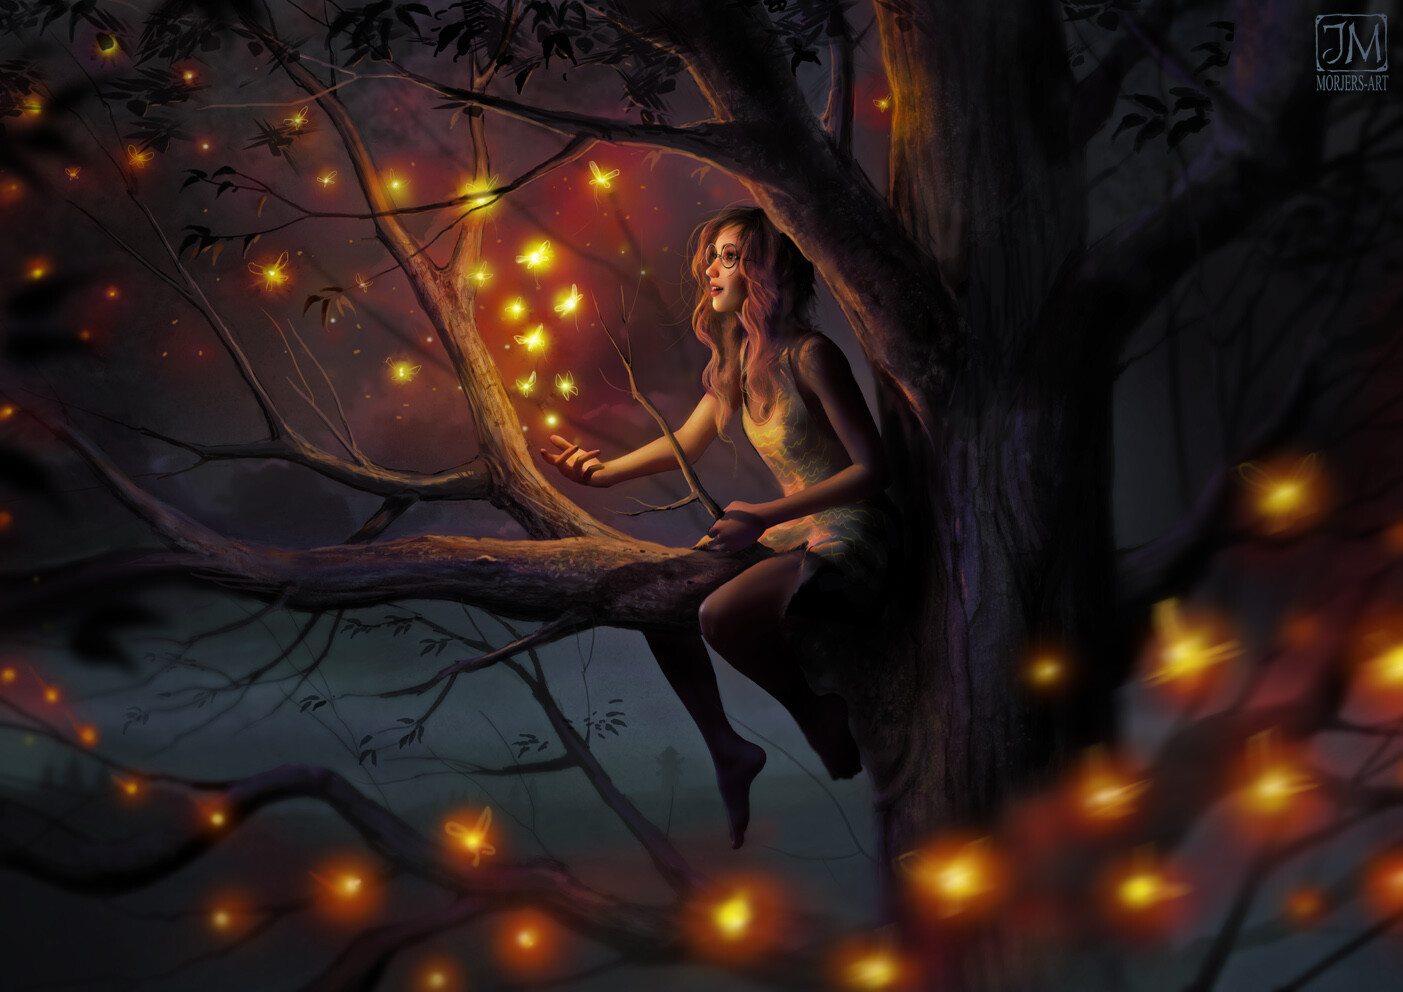 General 1403x992 artwork fantasy art fantasy girl women trees glasses women with glasses magic Jeremiah Morelli